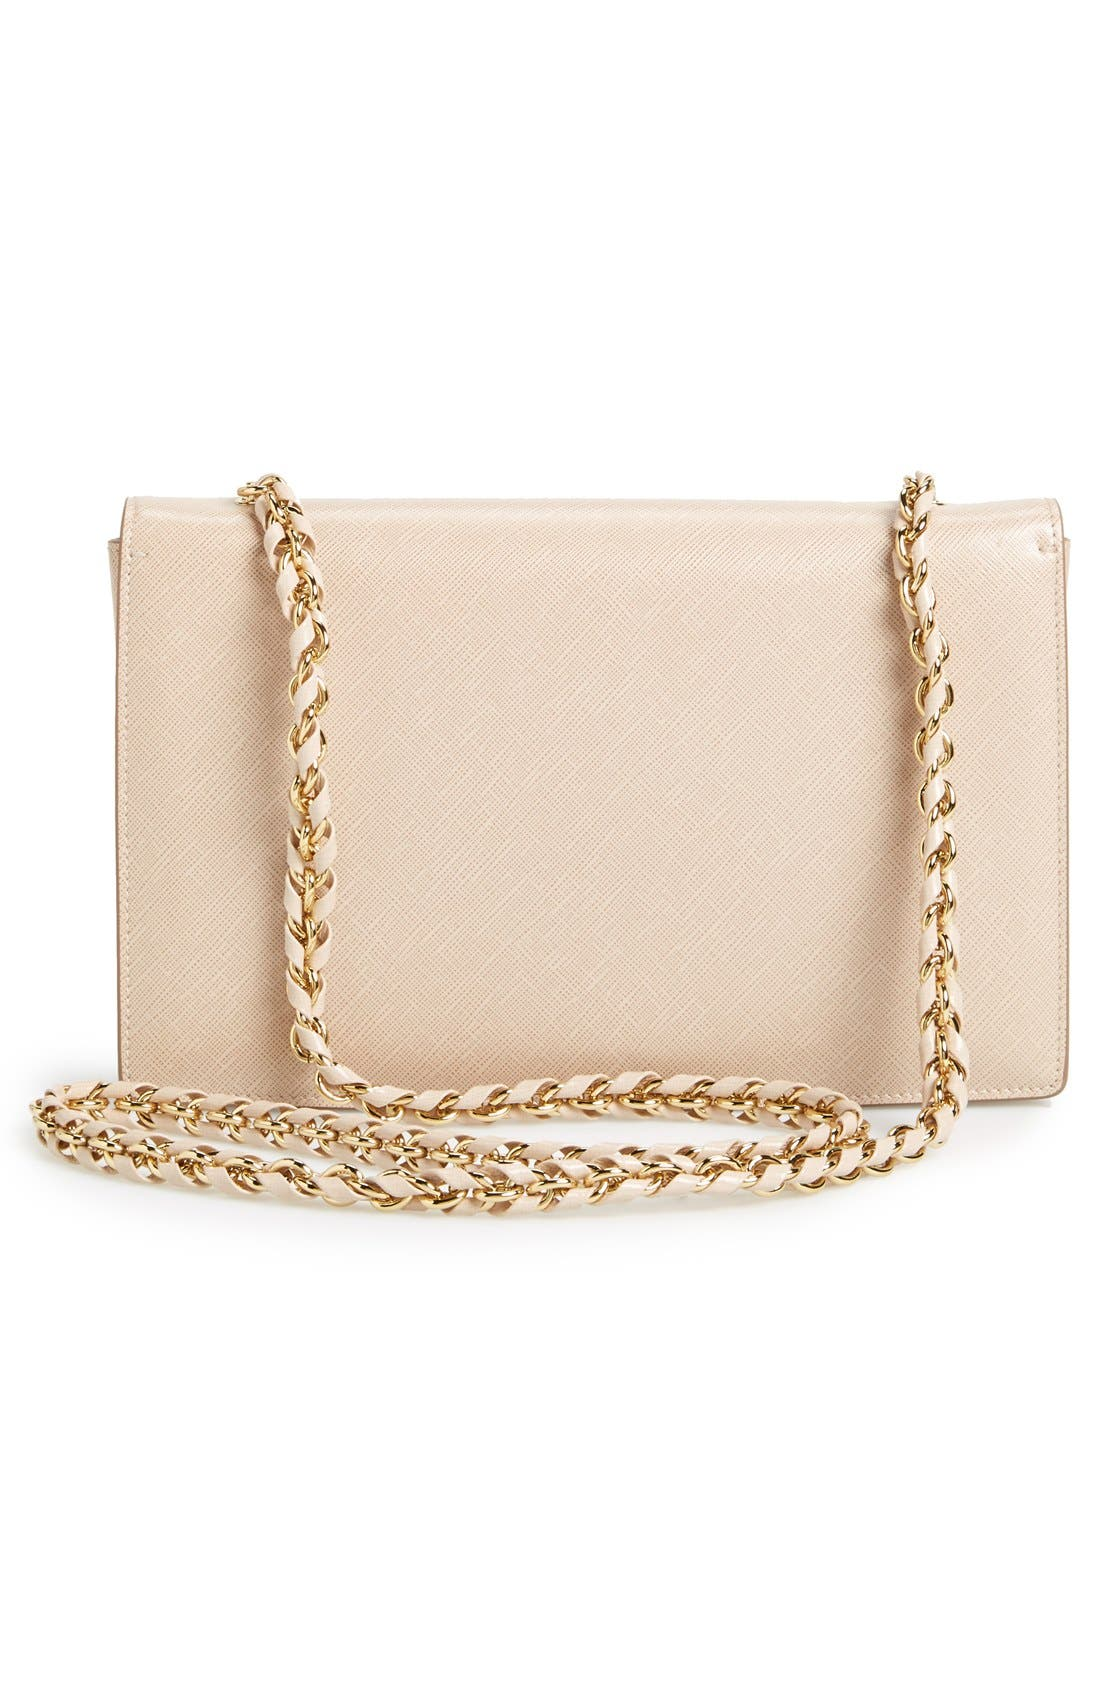 Saffiano Leather Shoulder Bag,                             Alternate thumbnail 4, color,                             250